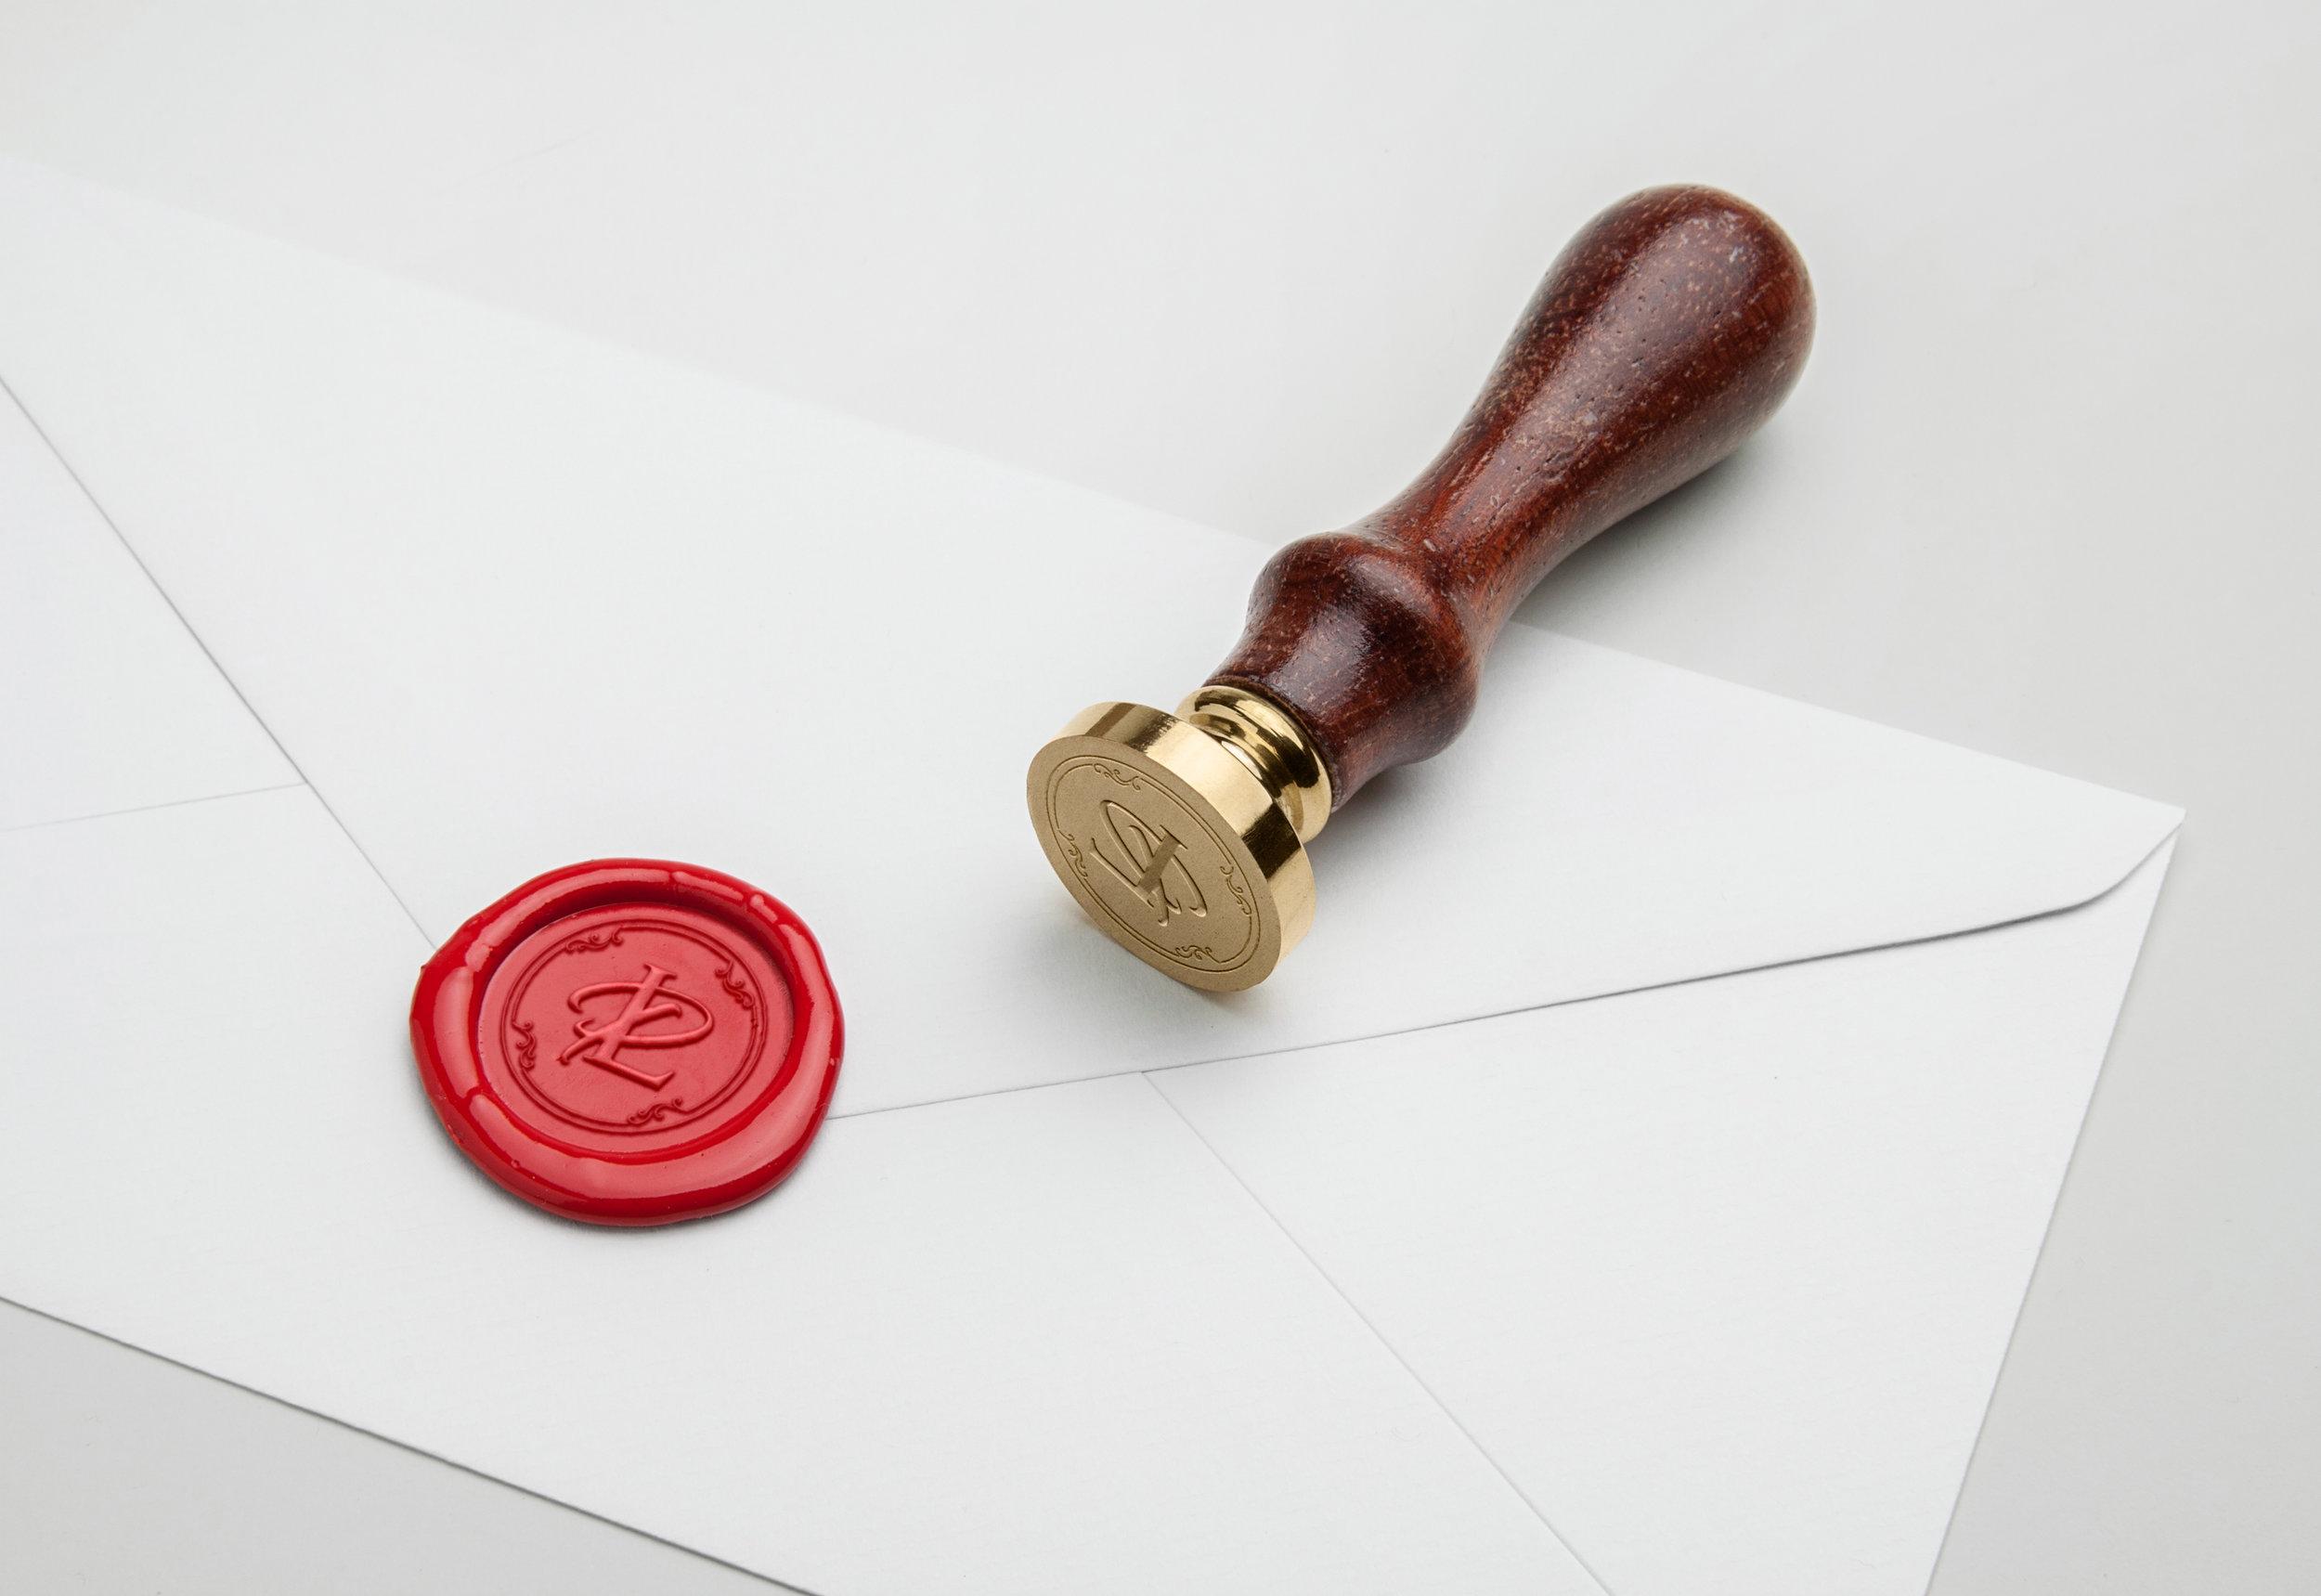 London Lash Pro wax stamp